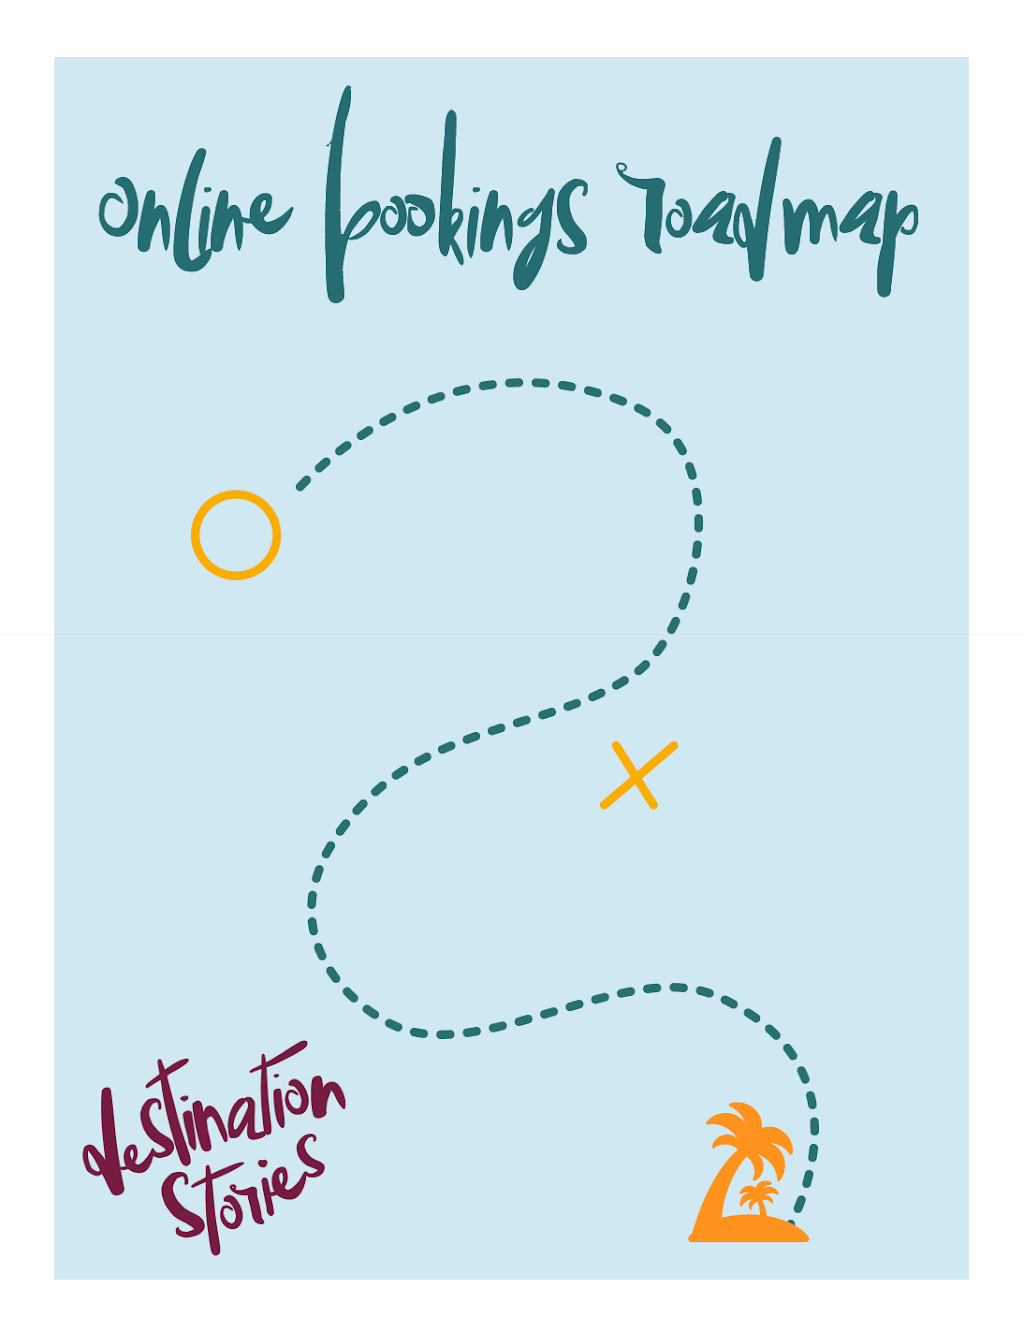 Online bookings roadmap cover